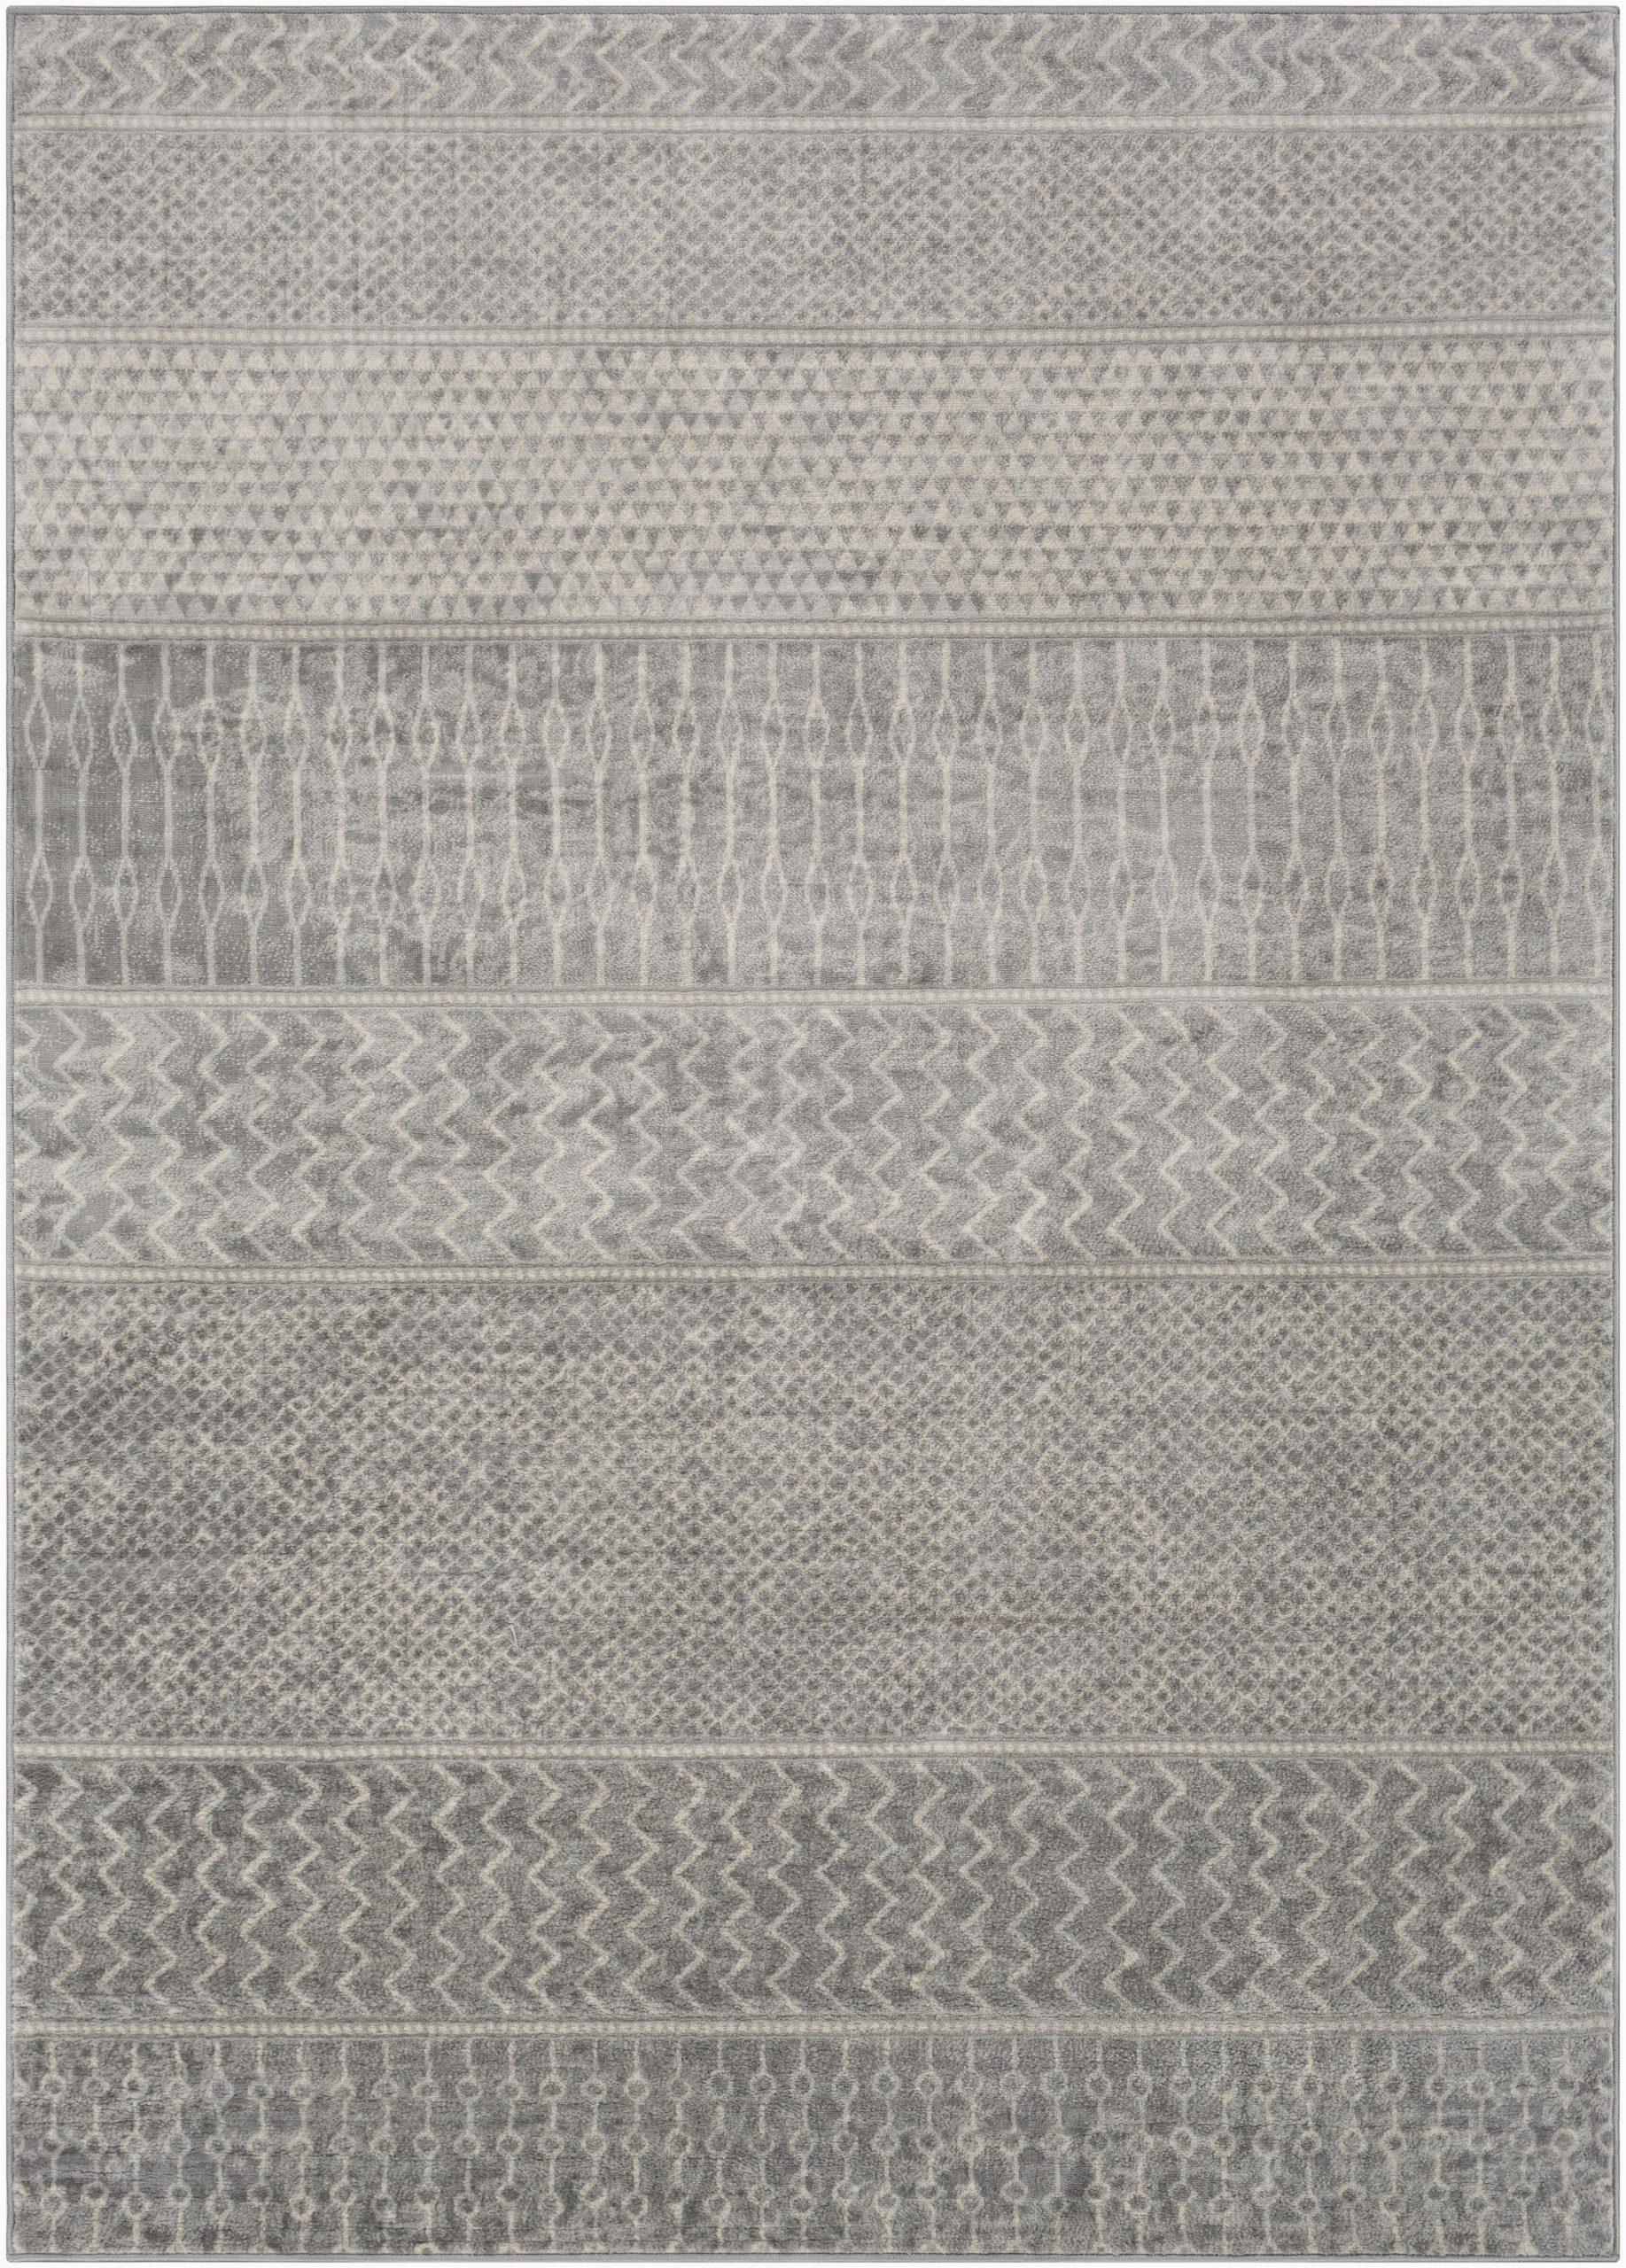 oppelo oriental sea foamrust area rug